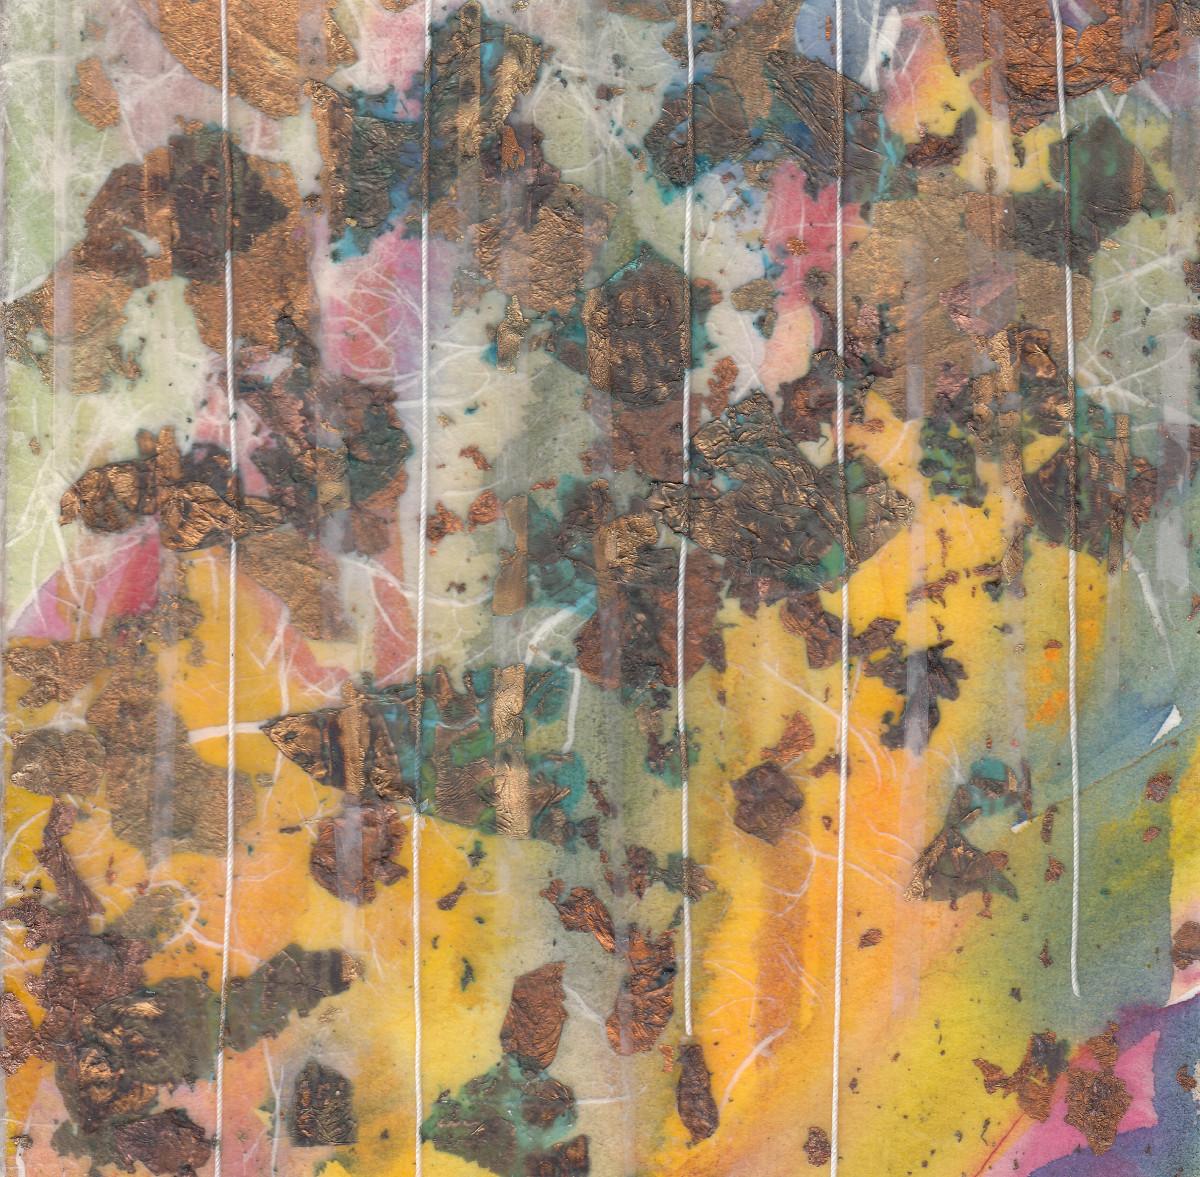 Strides by Gwen Meharg